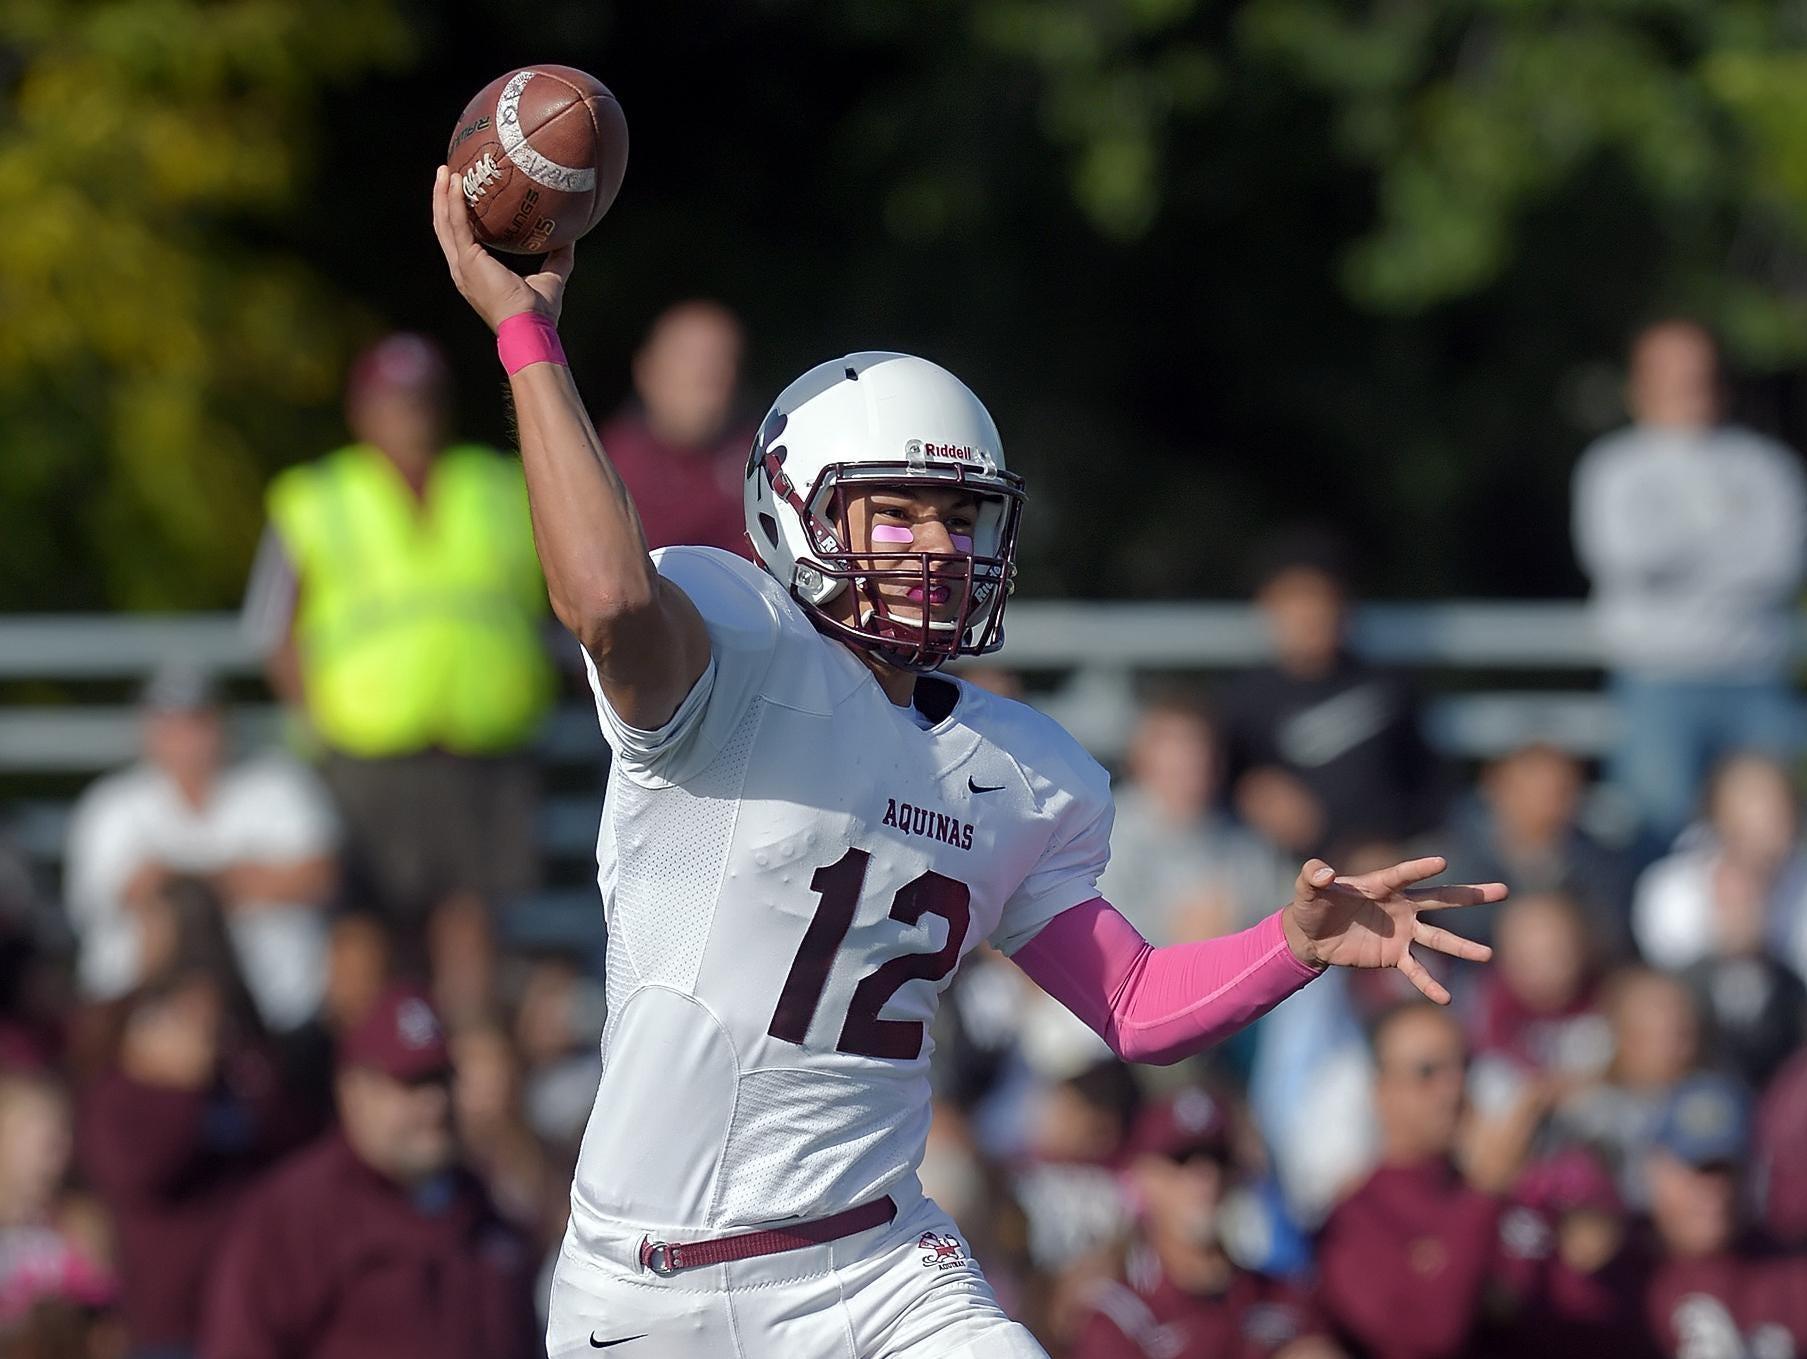 Aquinas quarterback Jake Zembiec has 20 touchdown passes in six games this season.